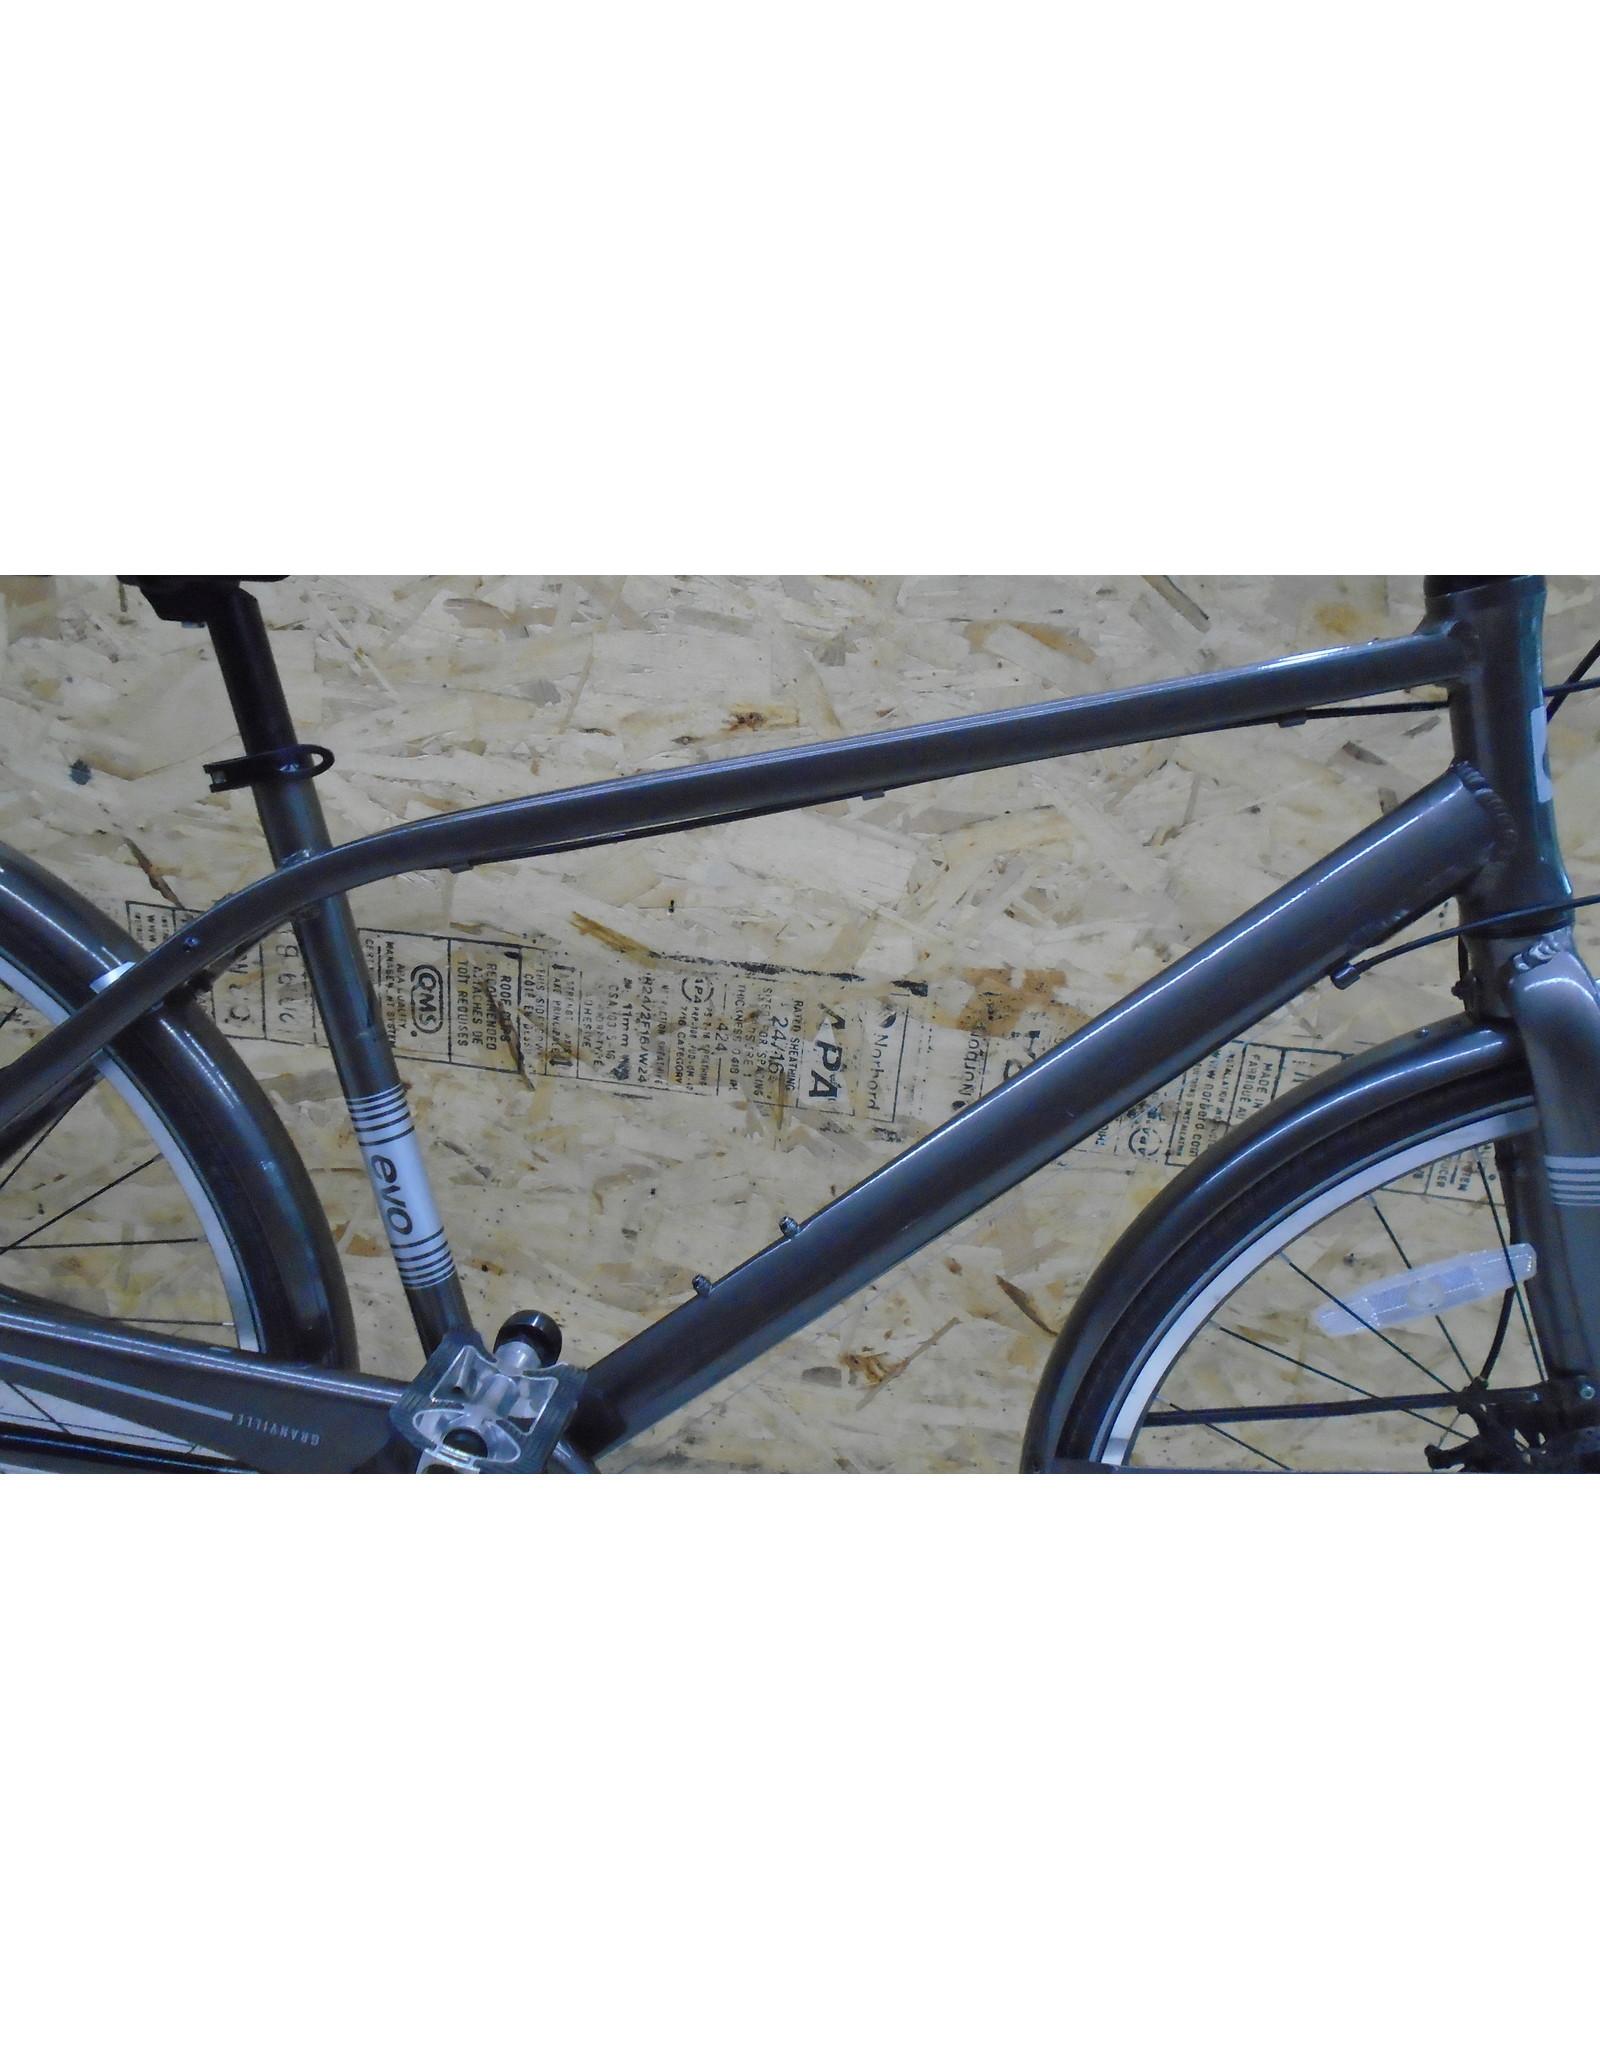 "Copy of Vélo usagé de montagne Giant 17"" - 10338"